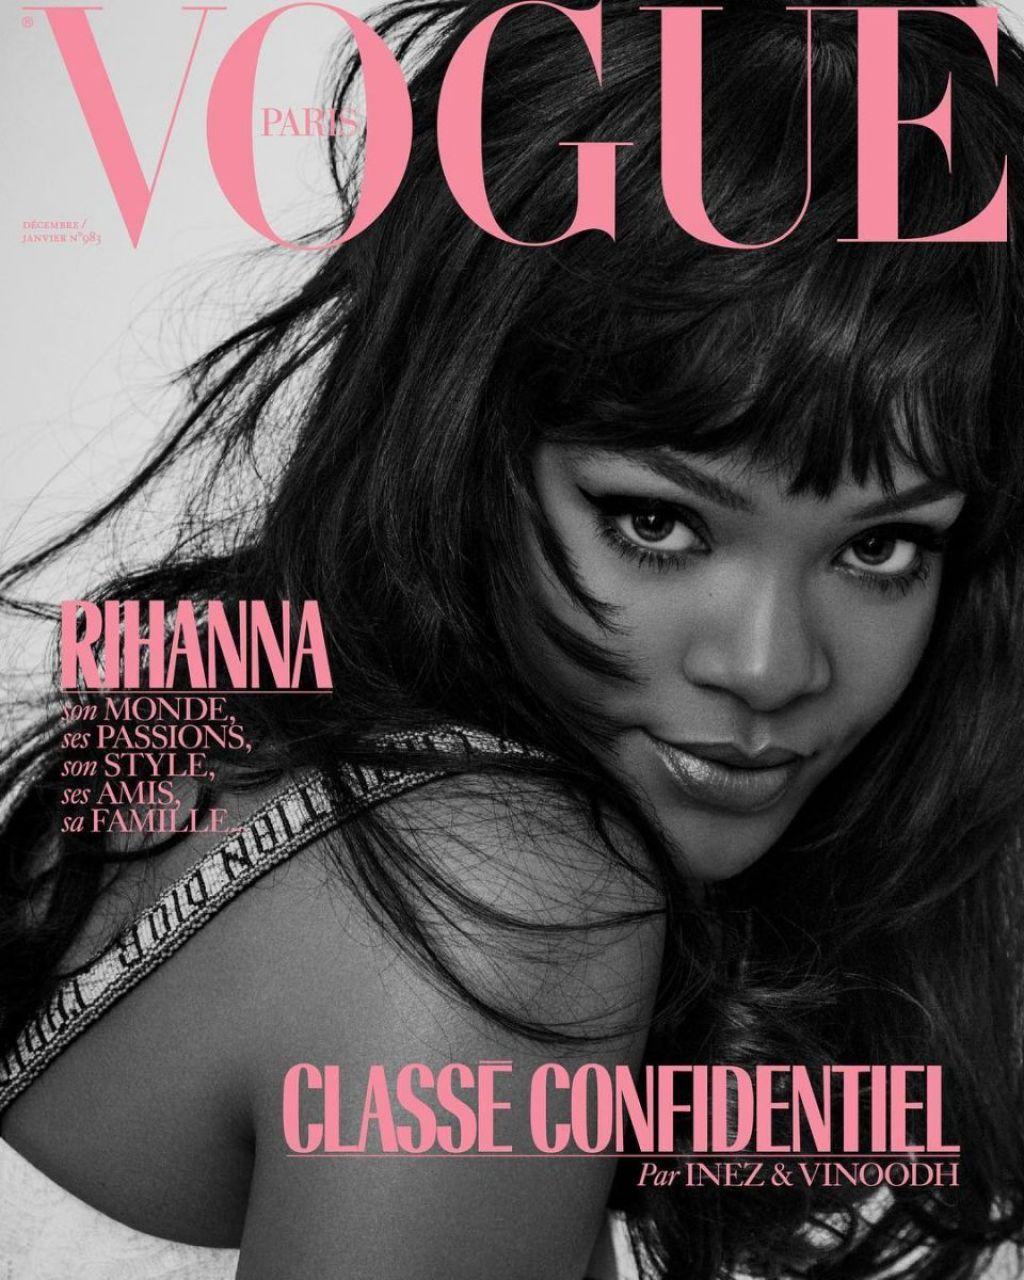 Vogue Magazine Subscription: Vogue Magazine Paris December 2017/January 2018